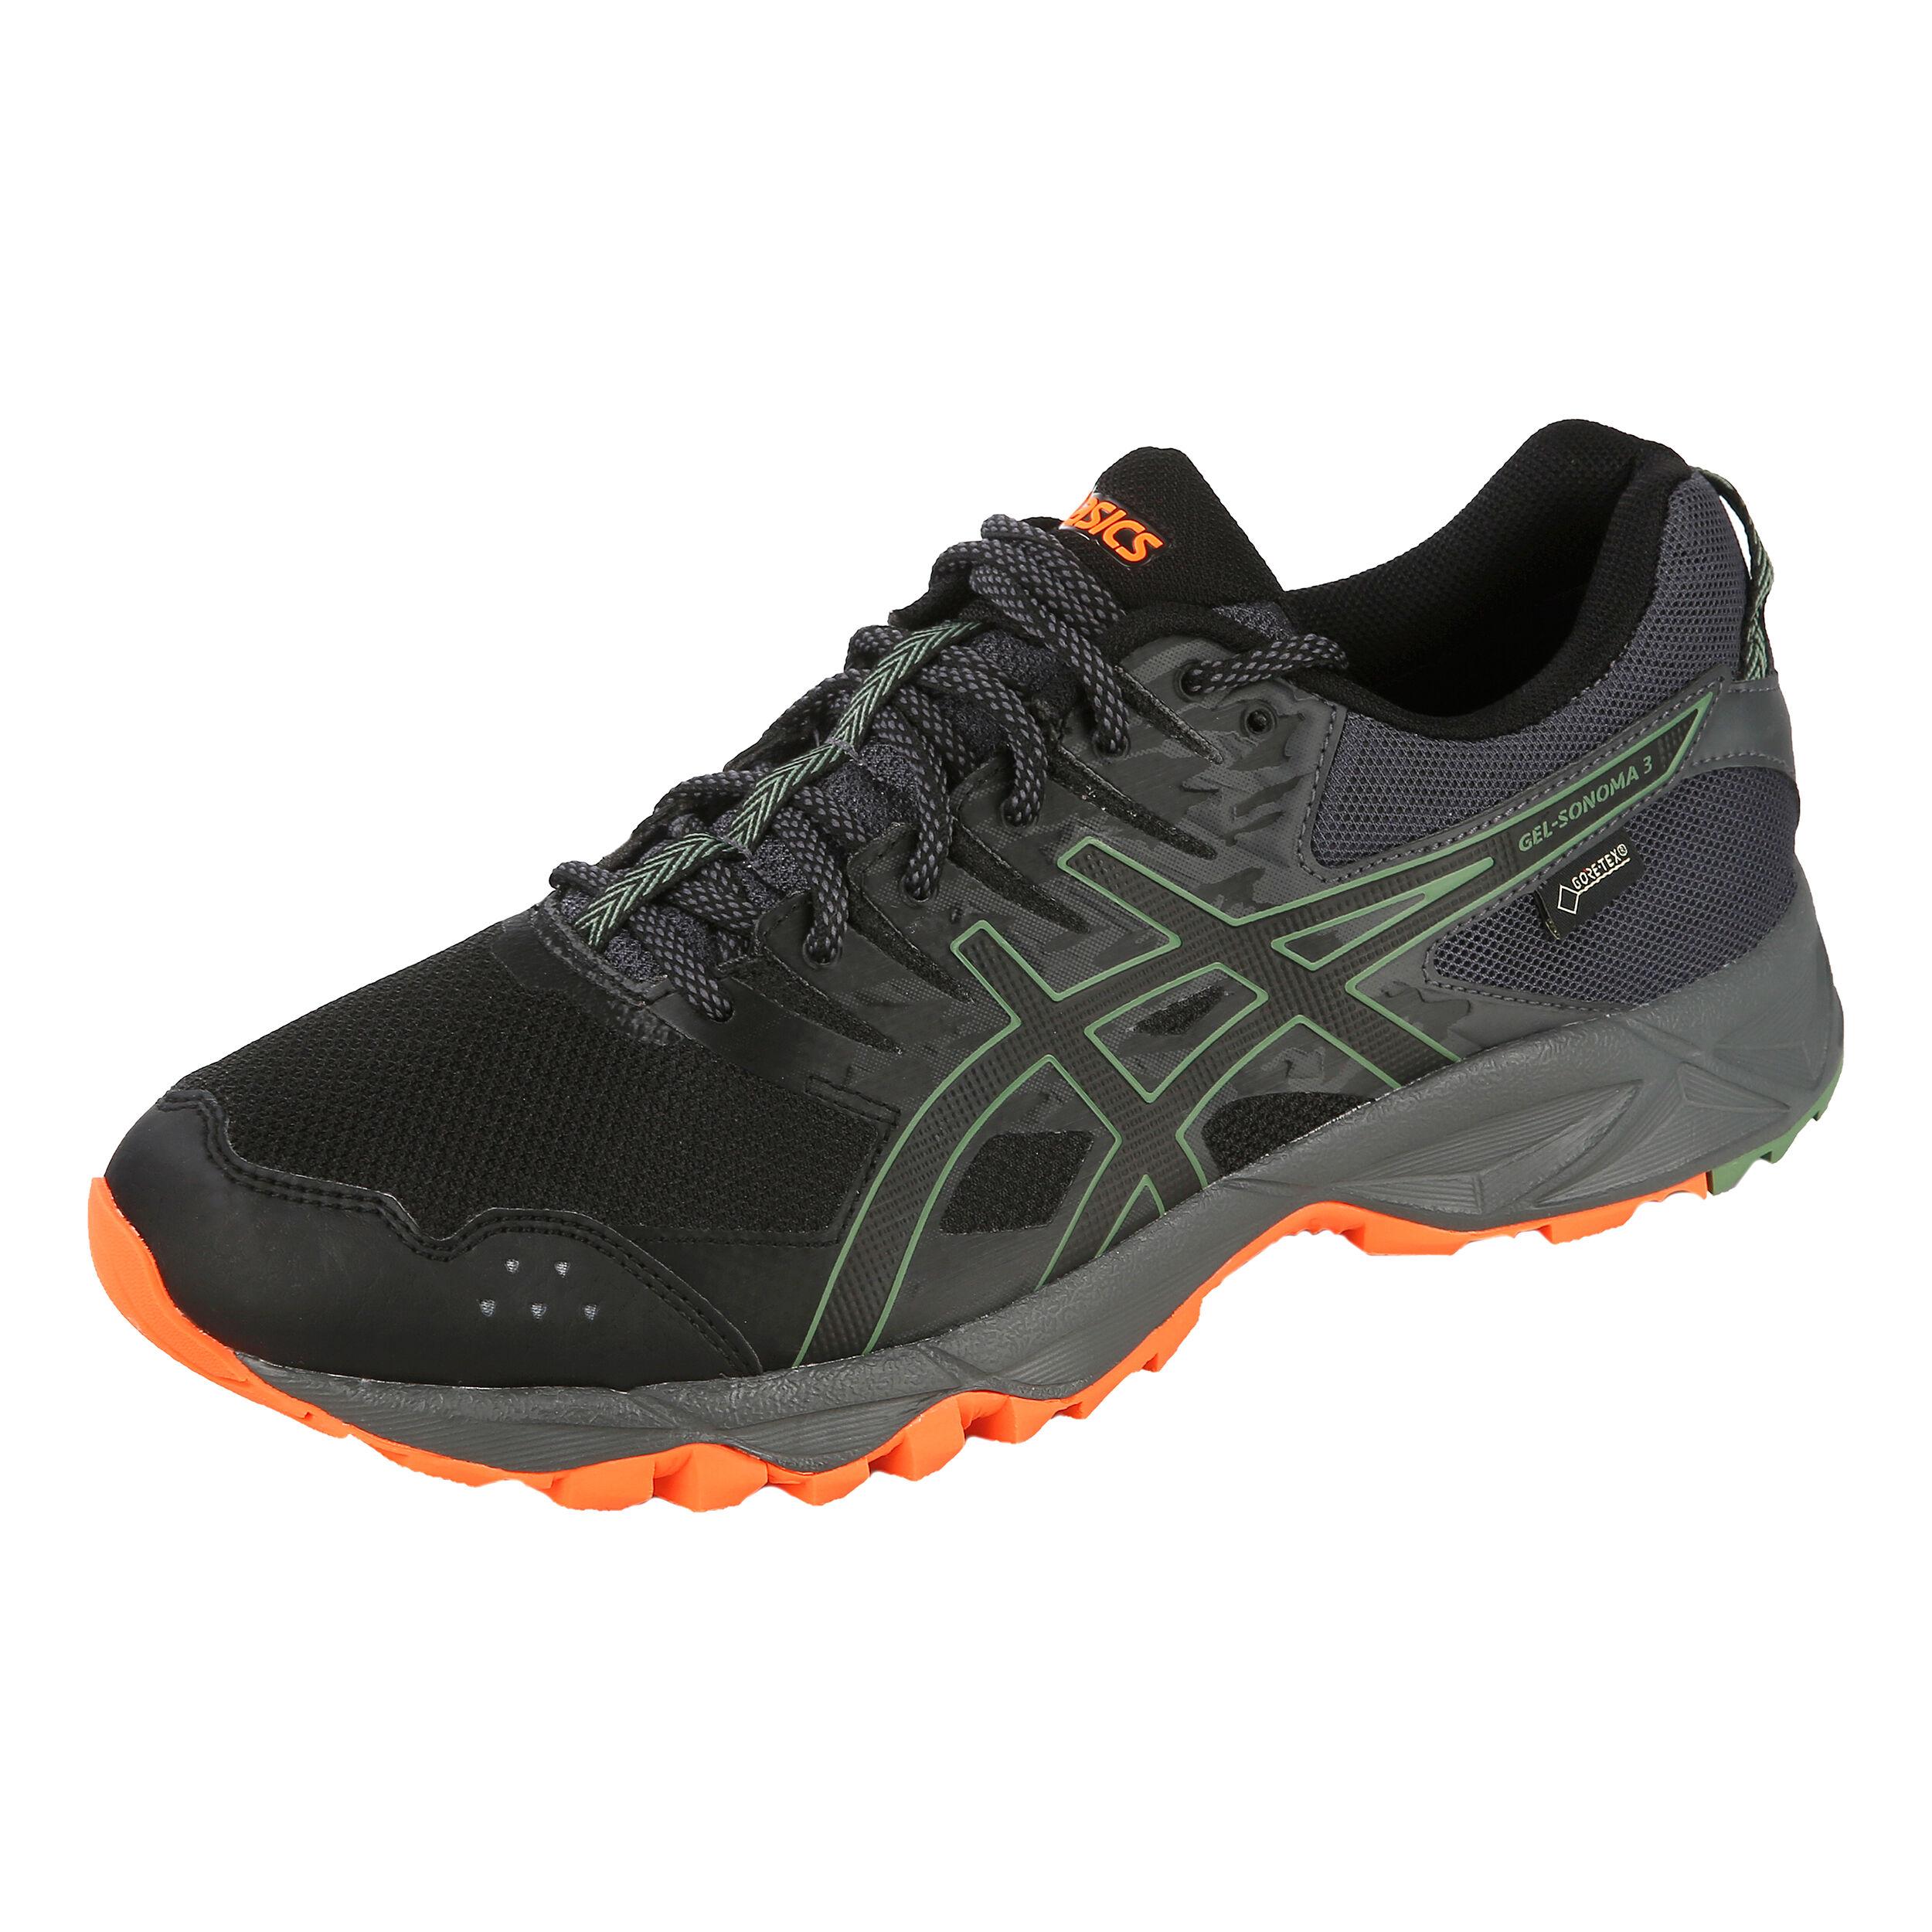 asics gel sonoma 3 gore-tex trail running shoes